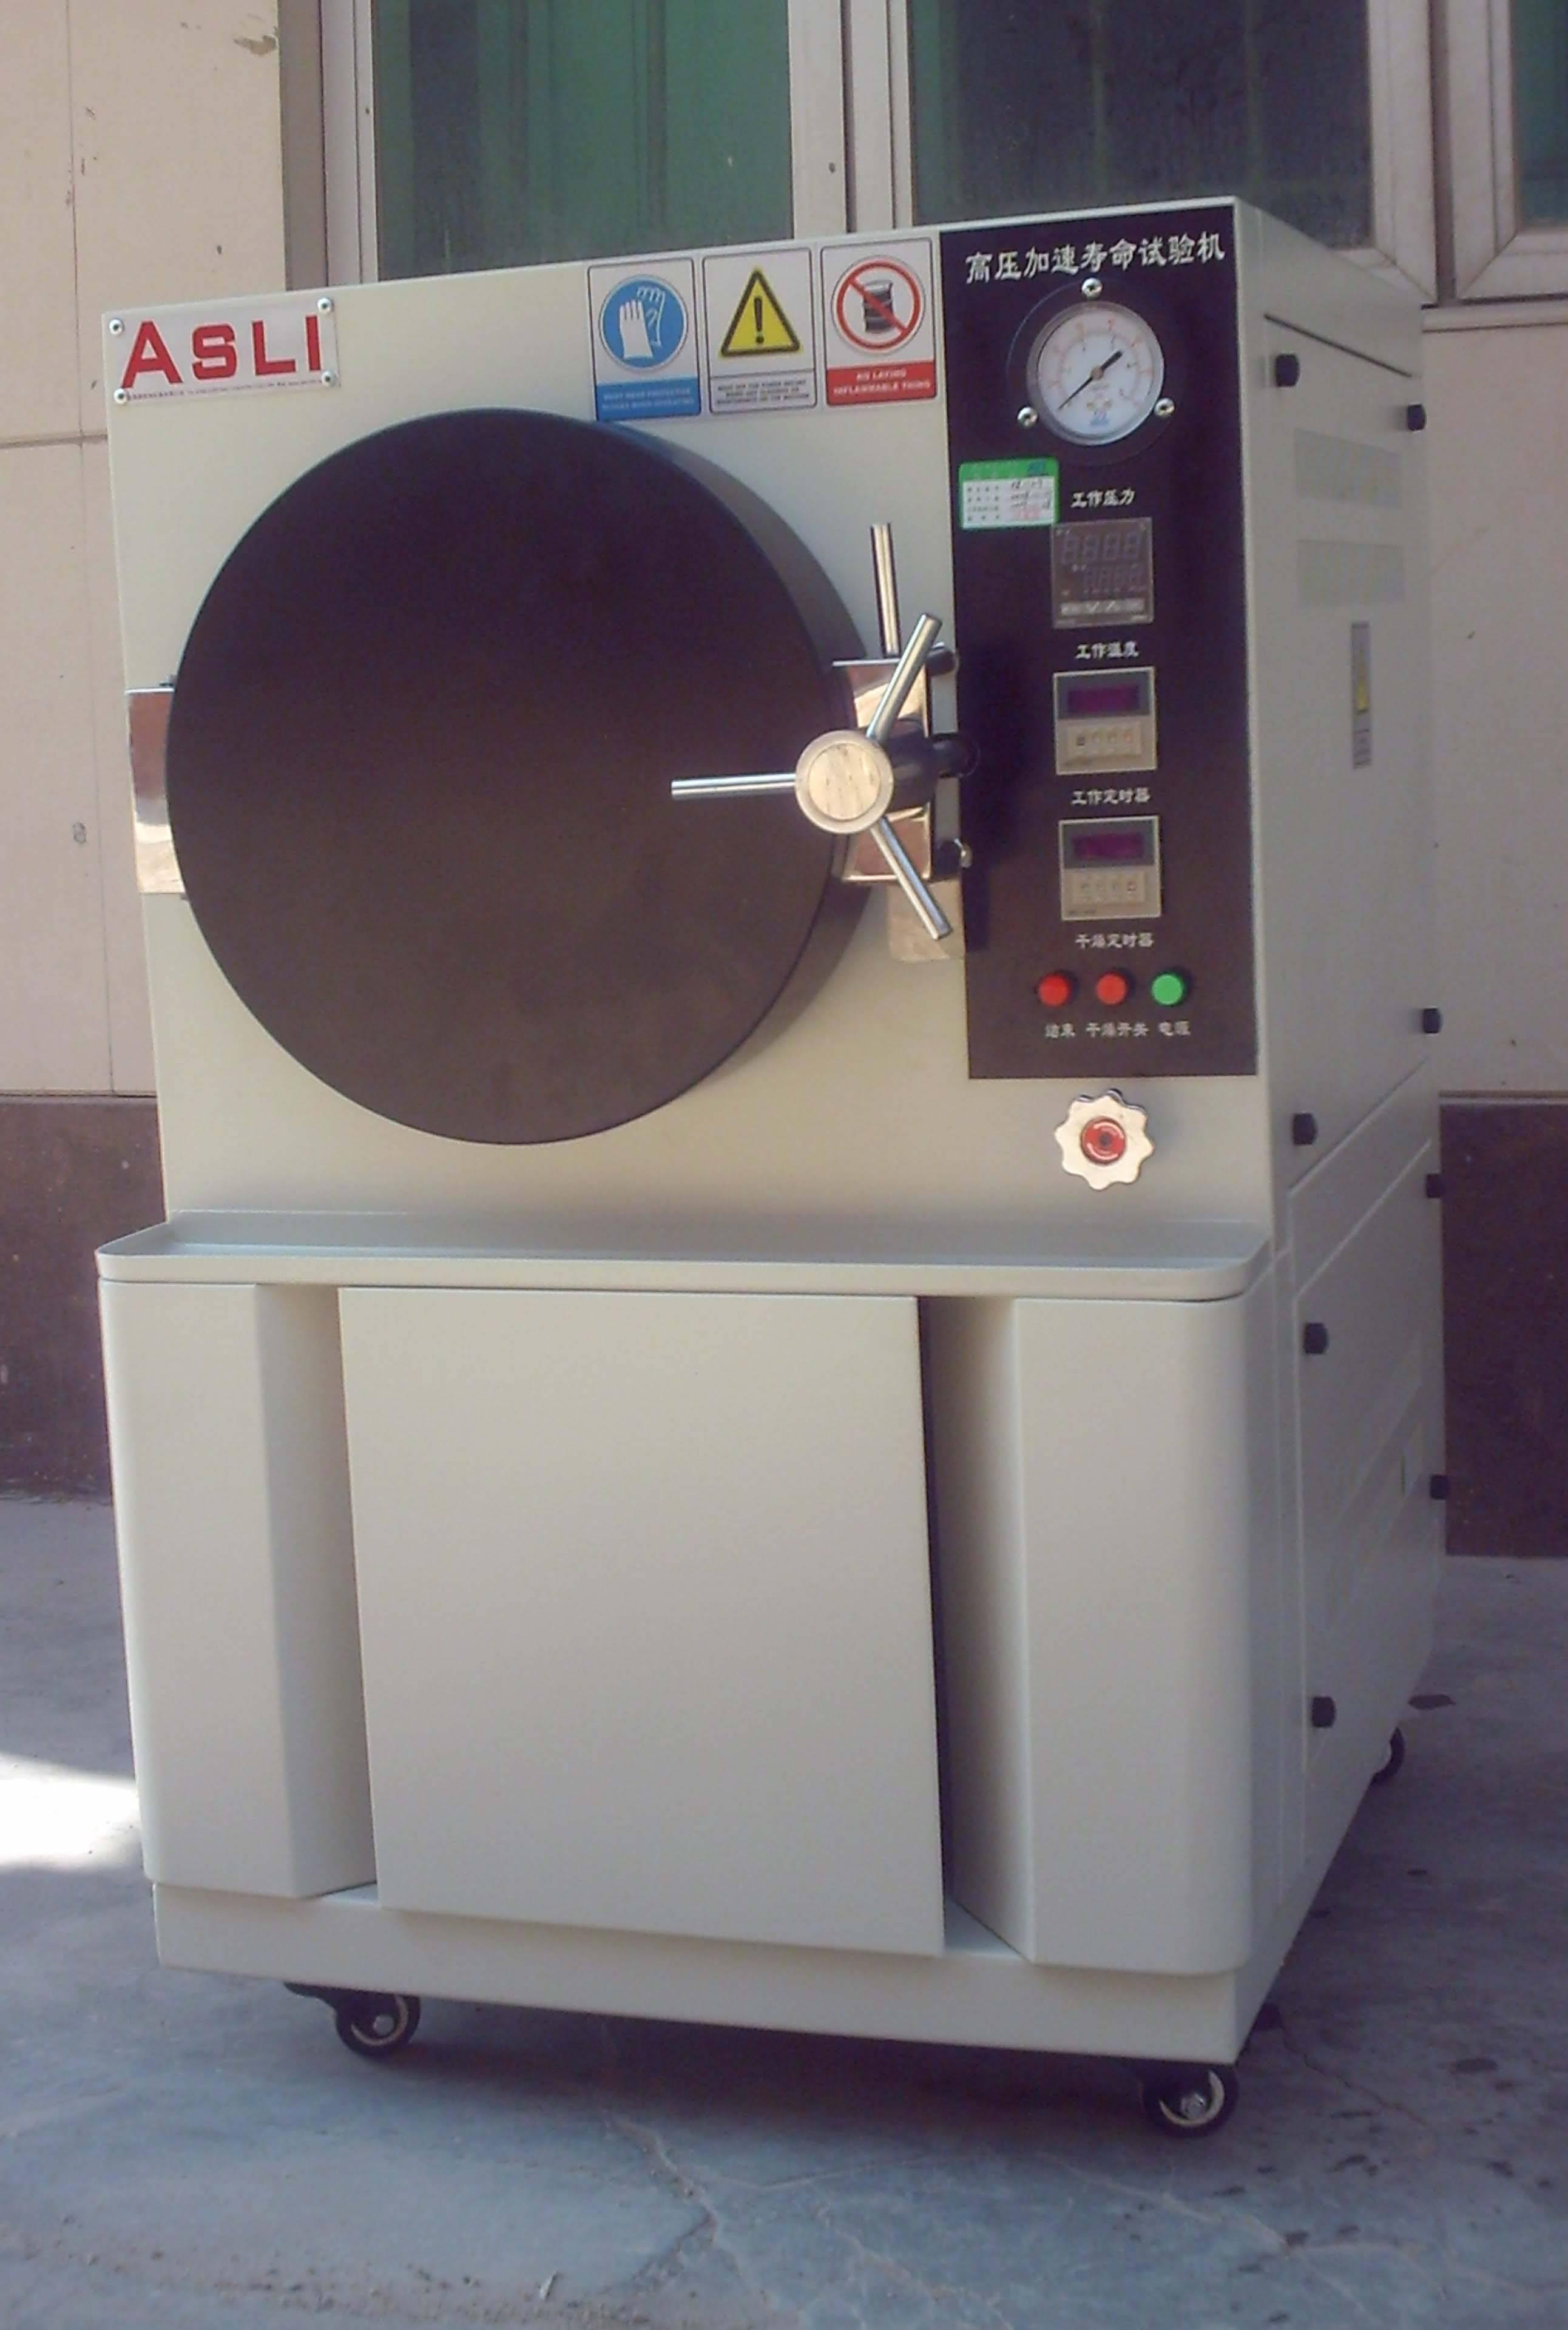 Pressure Cooker Test equipment